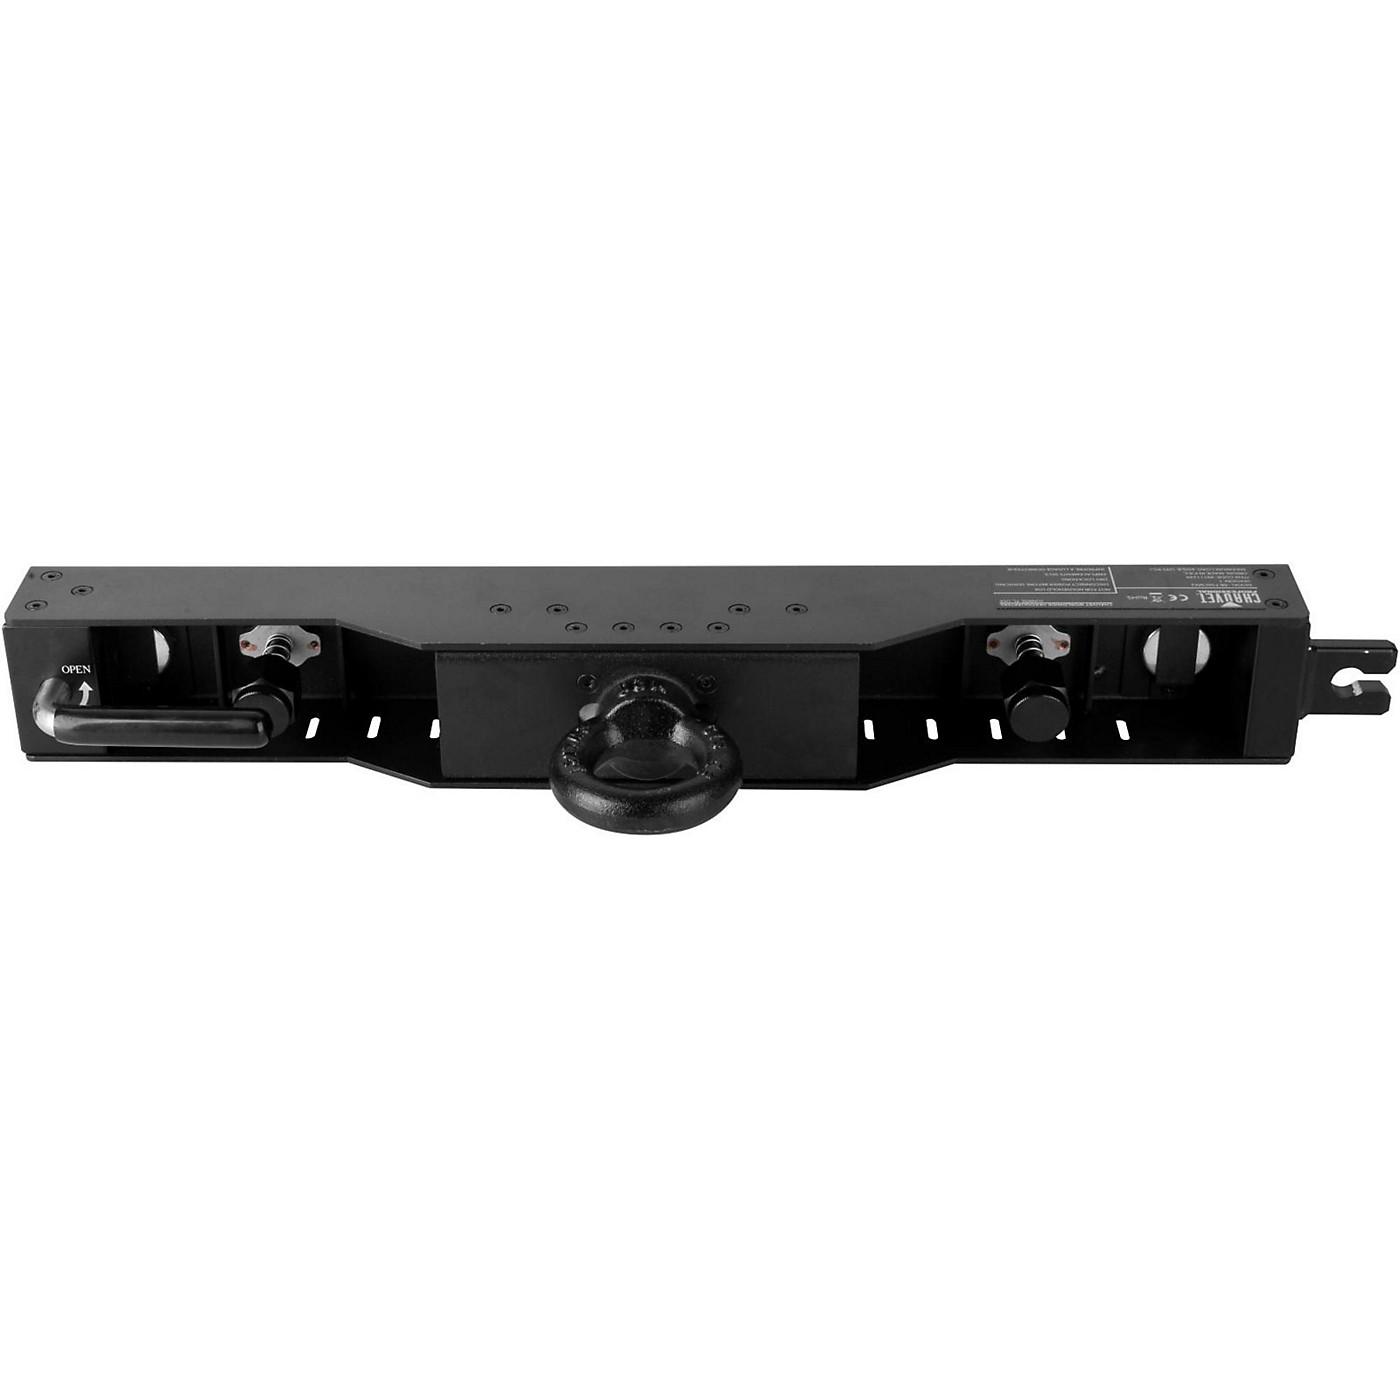 CHAUVET Professional RB-F50CM Rig Bar thumbnail